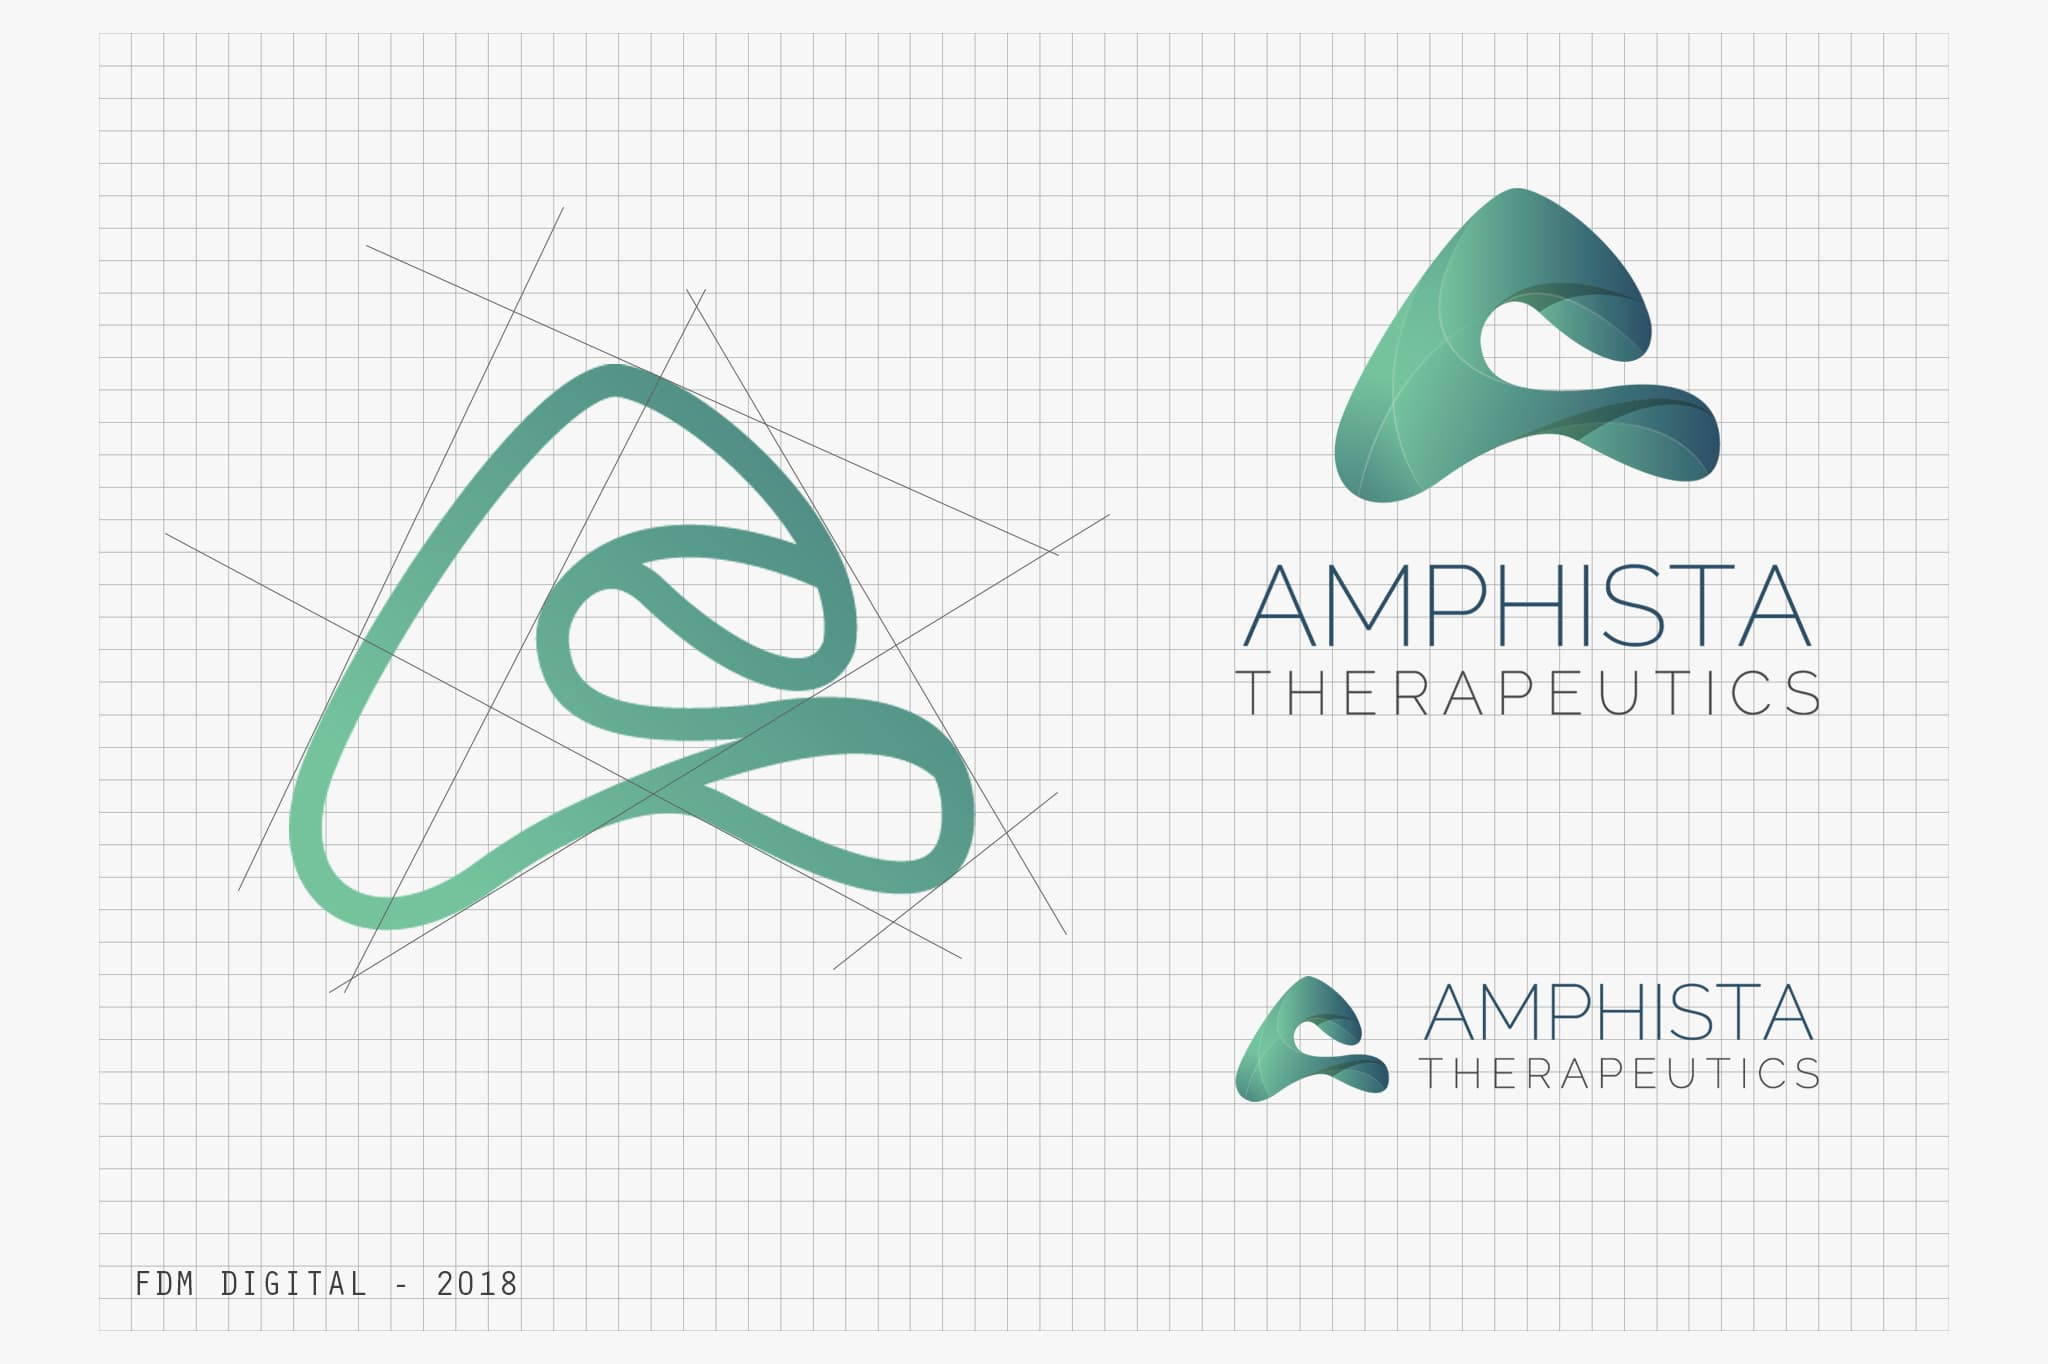 Amphista-5